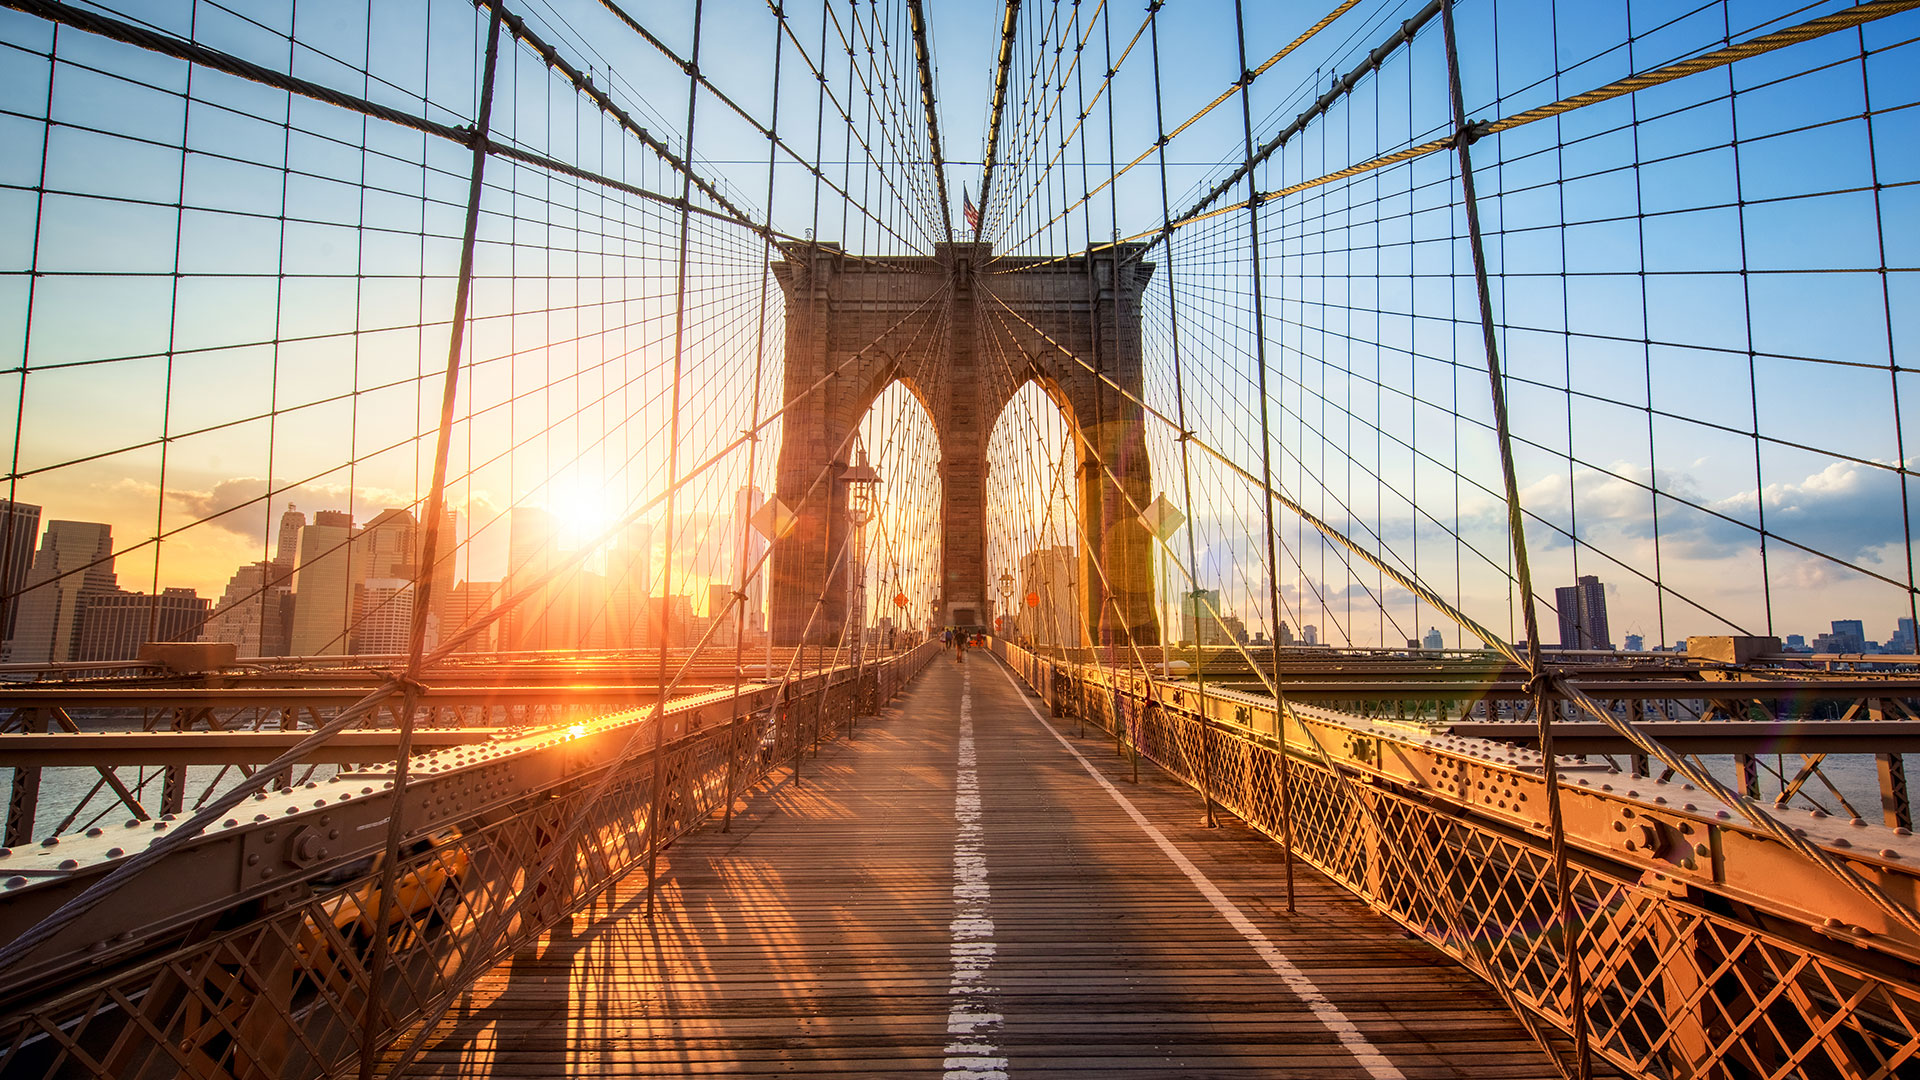 Brooklyn Bridge – Brooklyn-King County